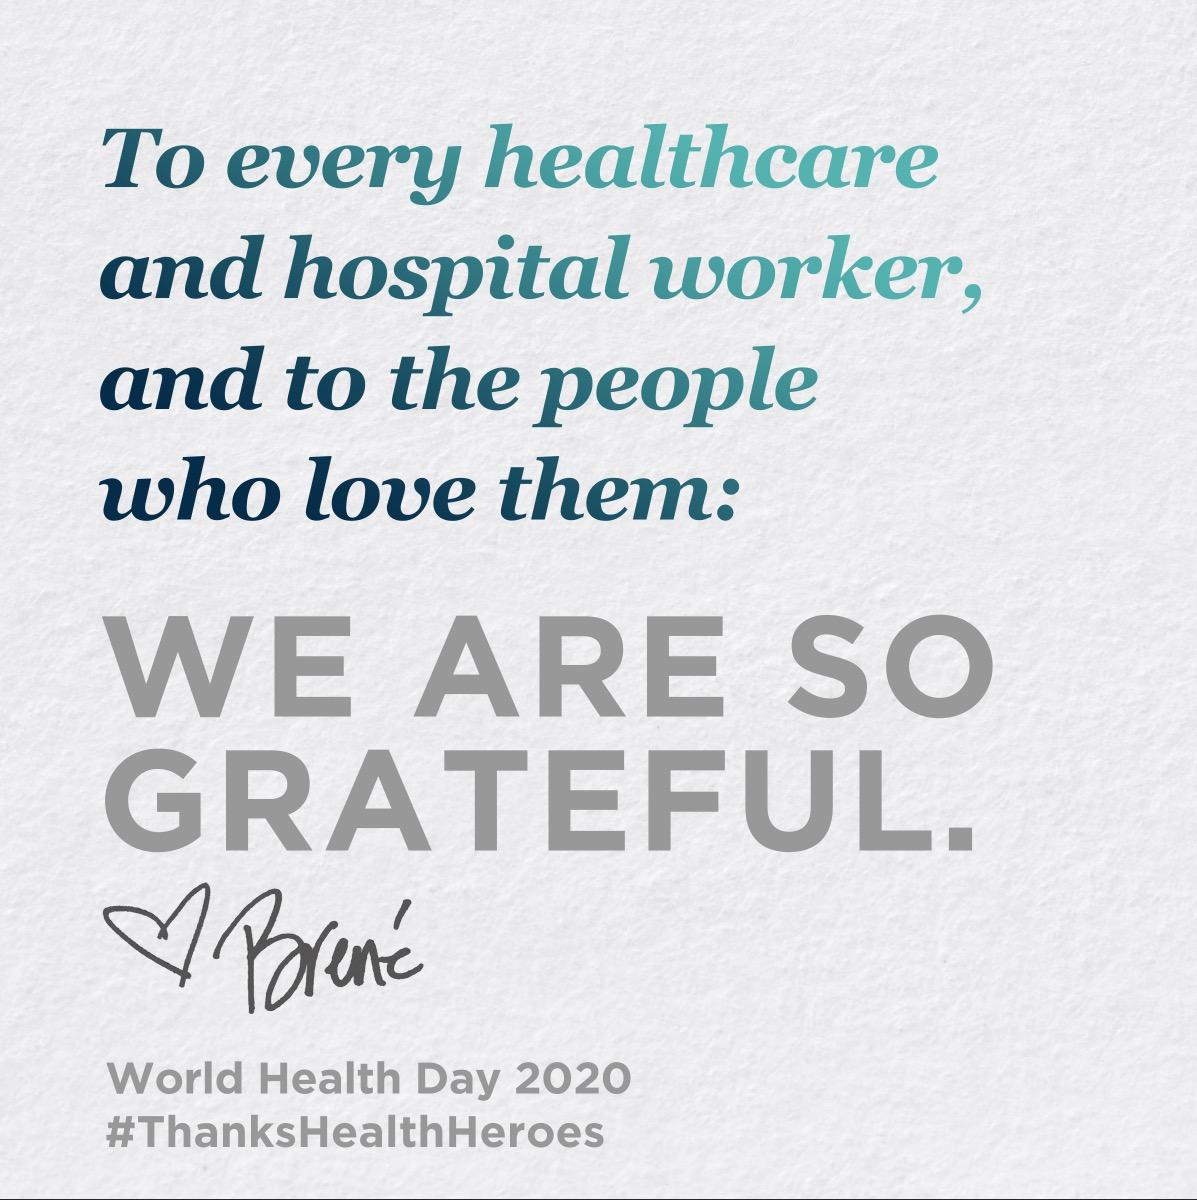 Clean hands. Grateful heart. #ThanksHealthHeroes